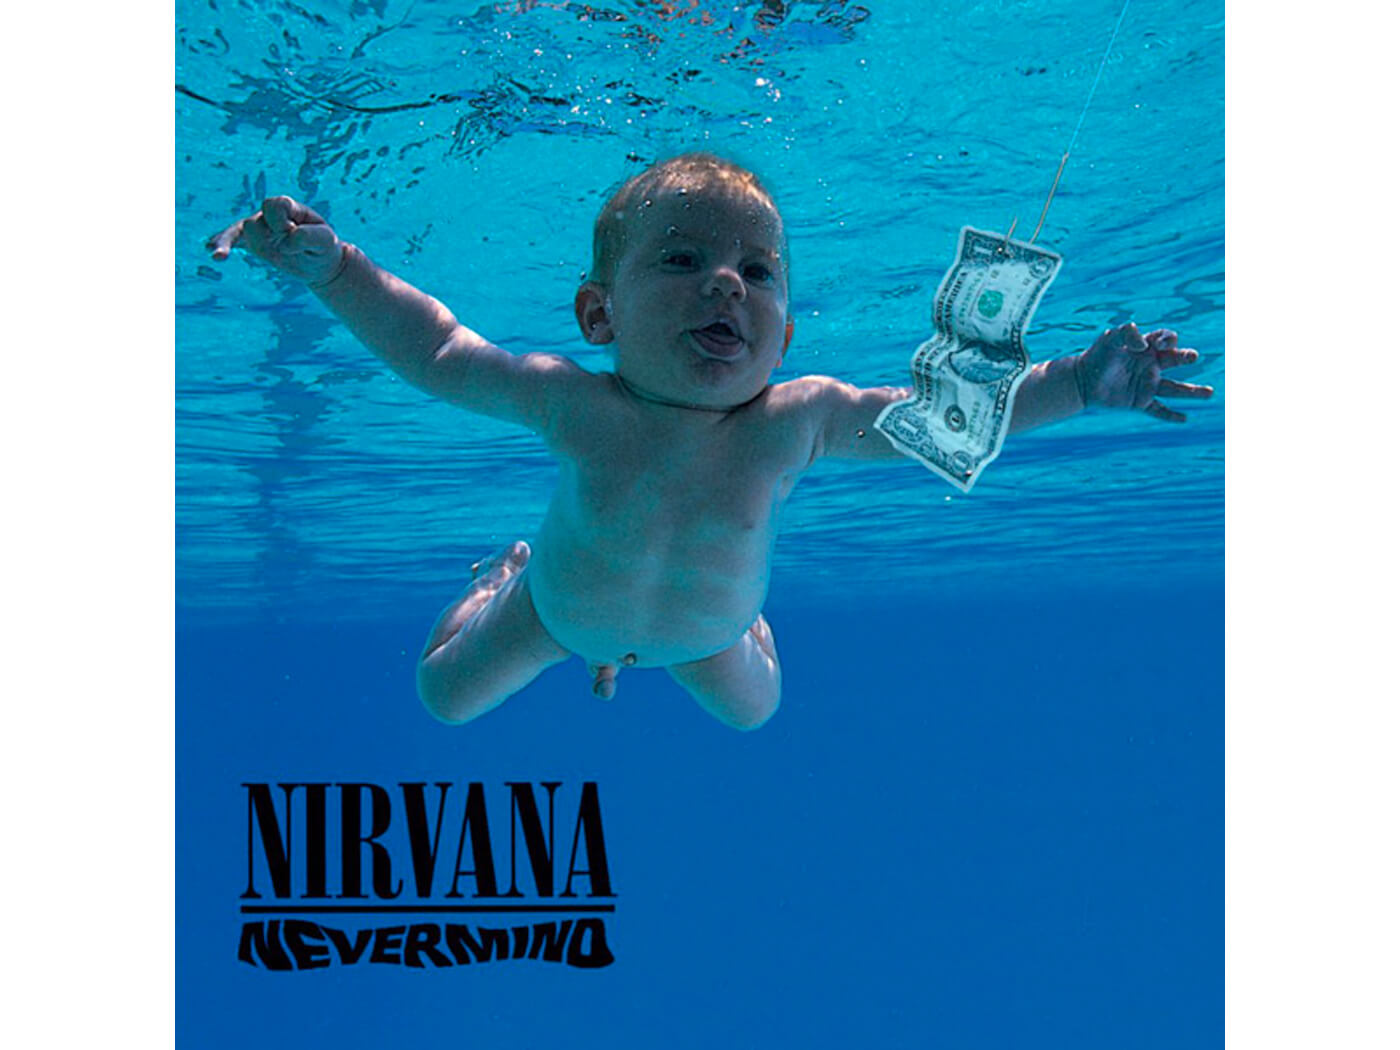 Nirvana's Nevermind (1991)